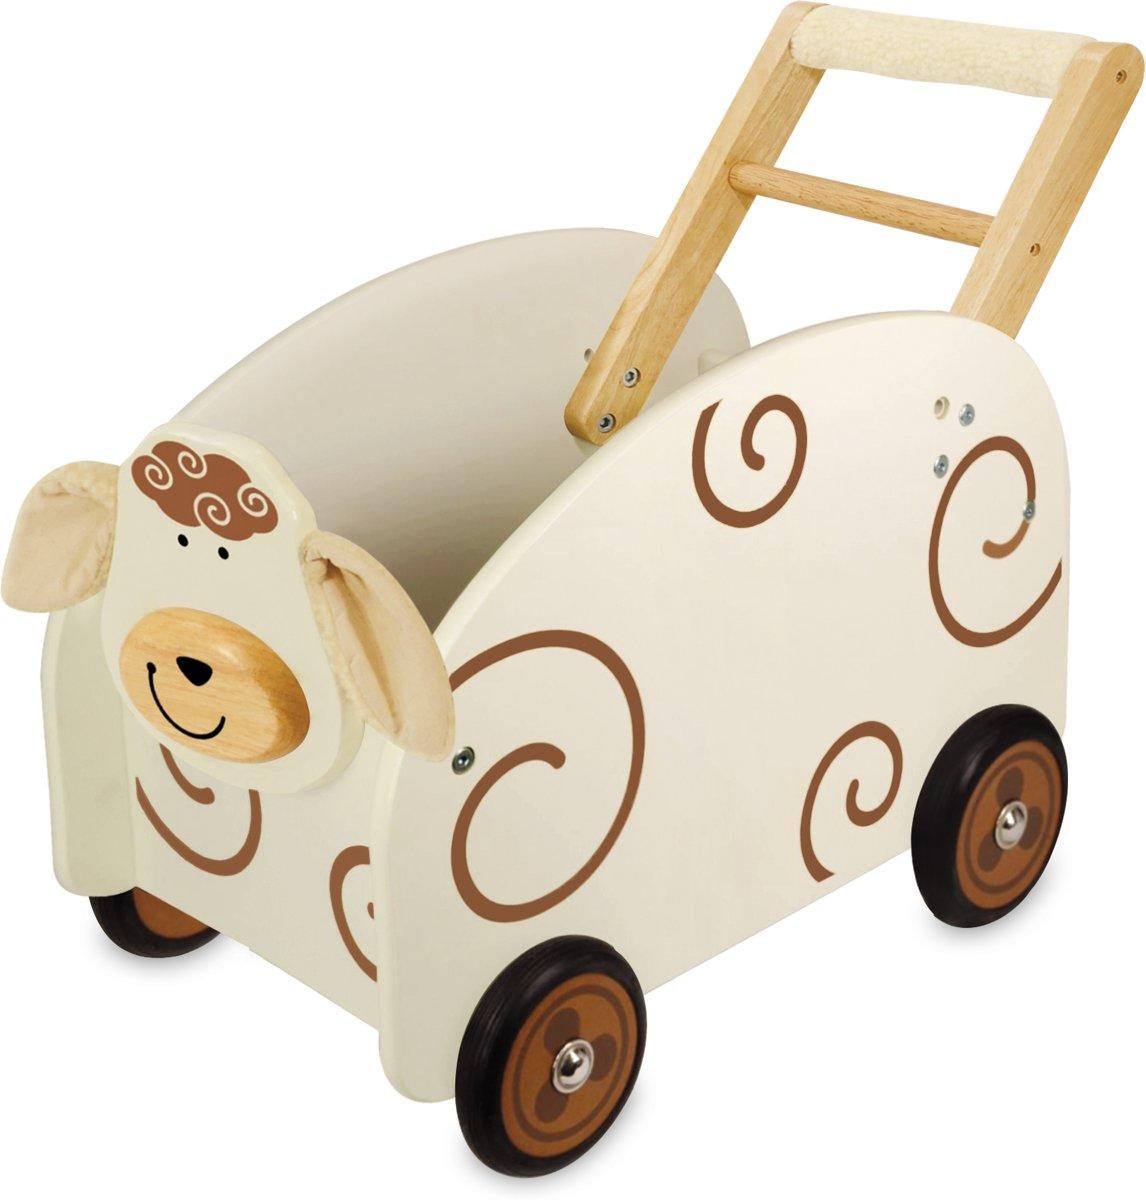 I'm Toy Loop/duwwagen Speelkist Schaap